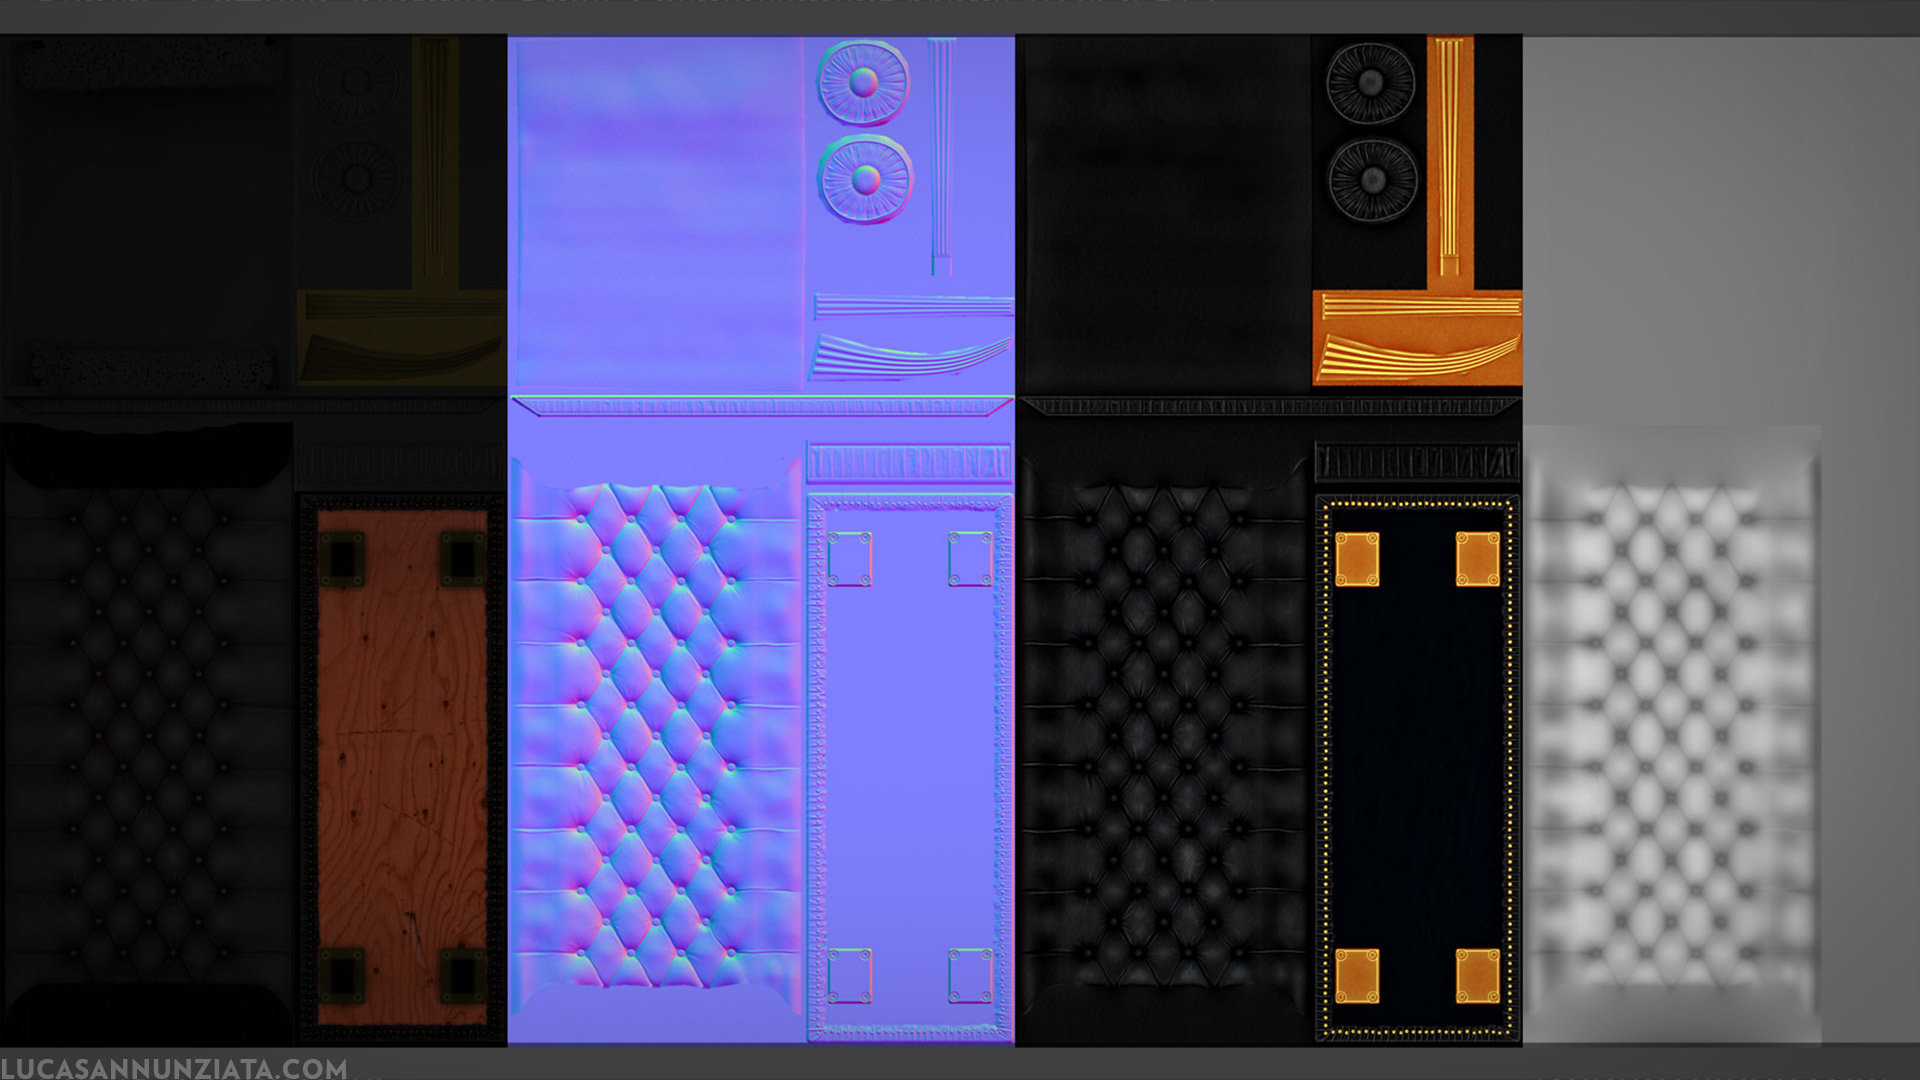 Lucas annunziata bench texture